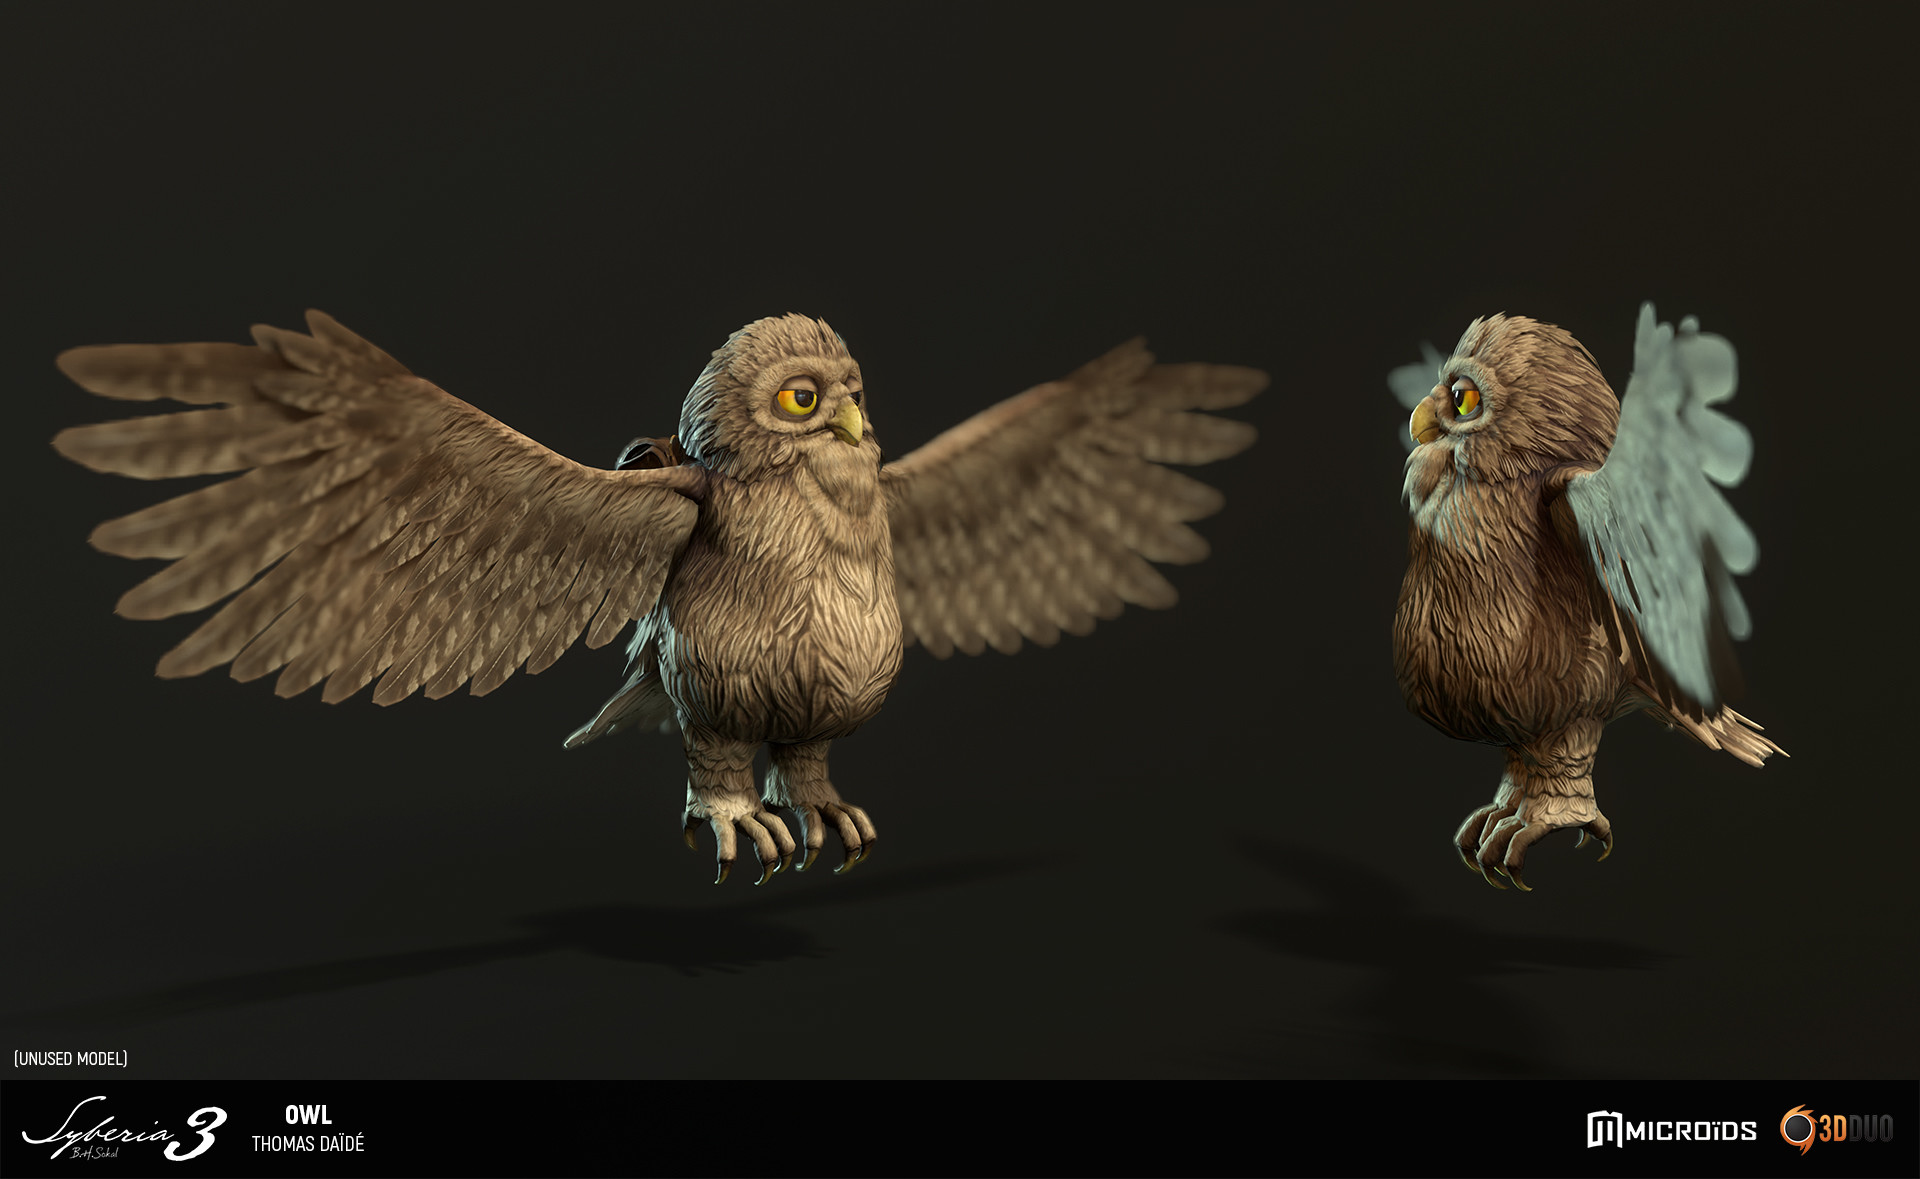 Thomas daide tdaide syb owl 04